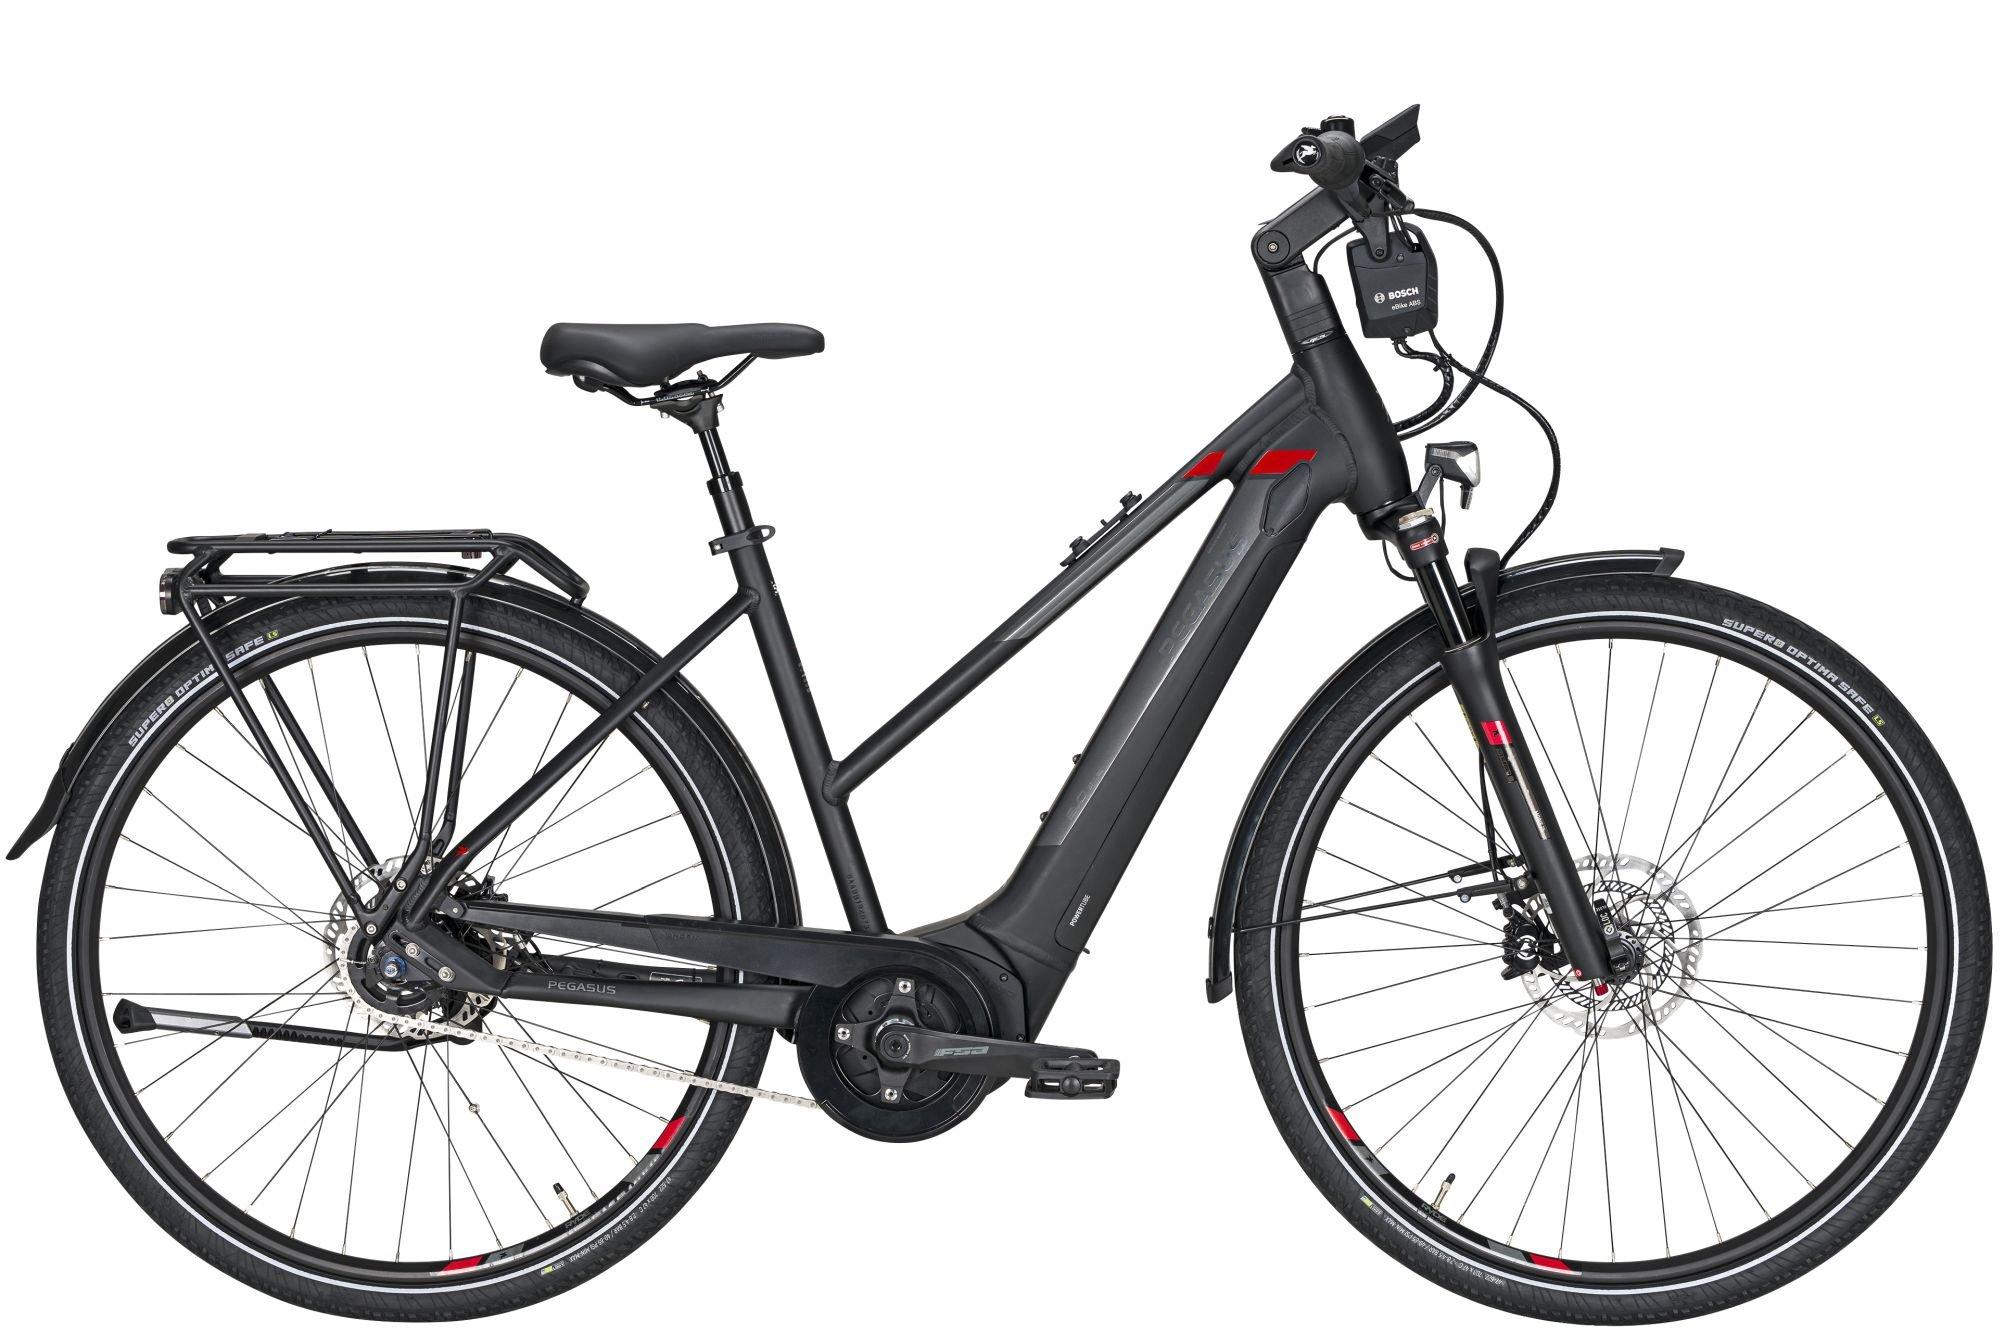 E-Bikes: Pegasus  Premio Evo 5F ABS (400 Wh) 5 Gang Nabenschaltung Damenfahrrad Trapez Modell 2021 28 Zoll 45 cm